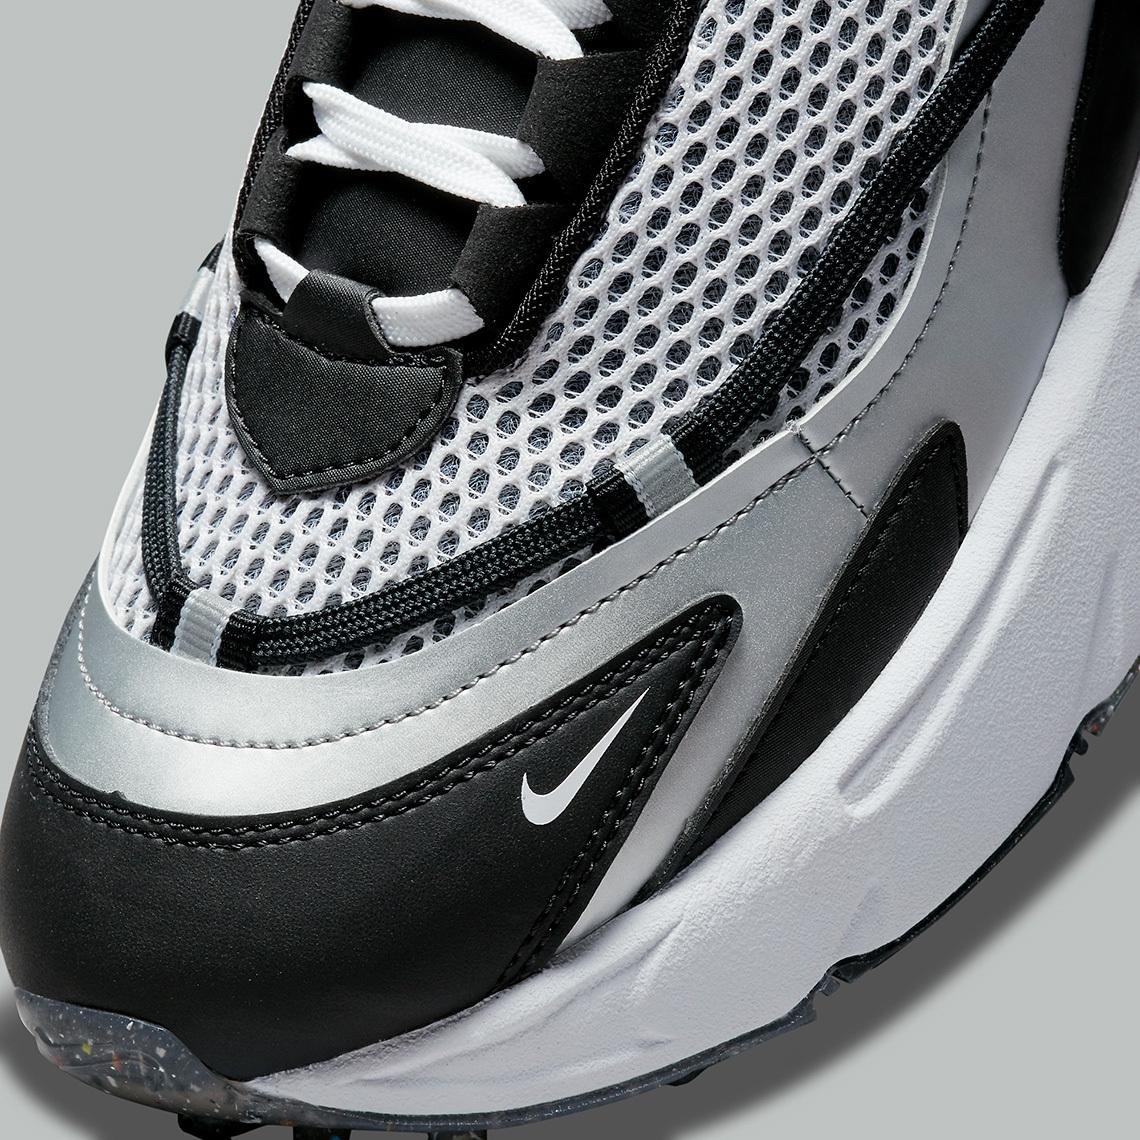 Nike Air Max Furyosa NRG ''Metallic Silver'' - DC7350-001